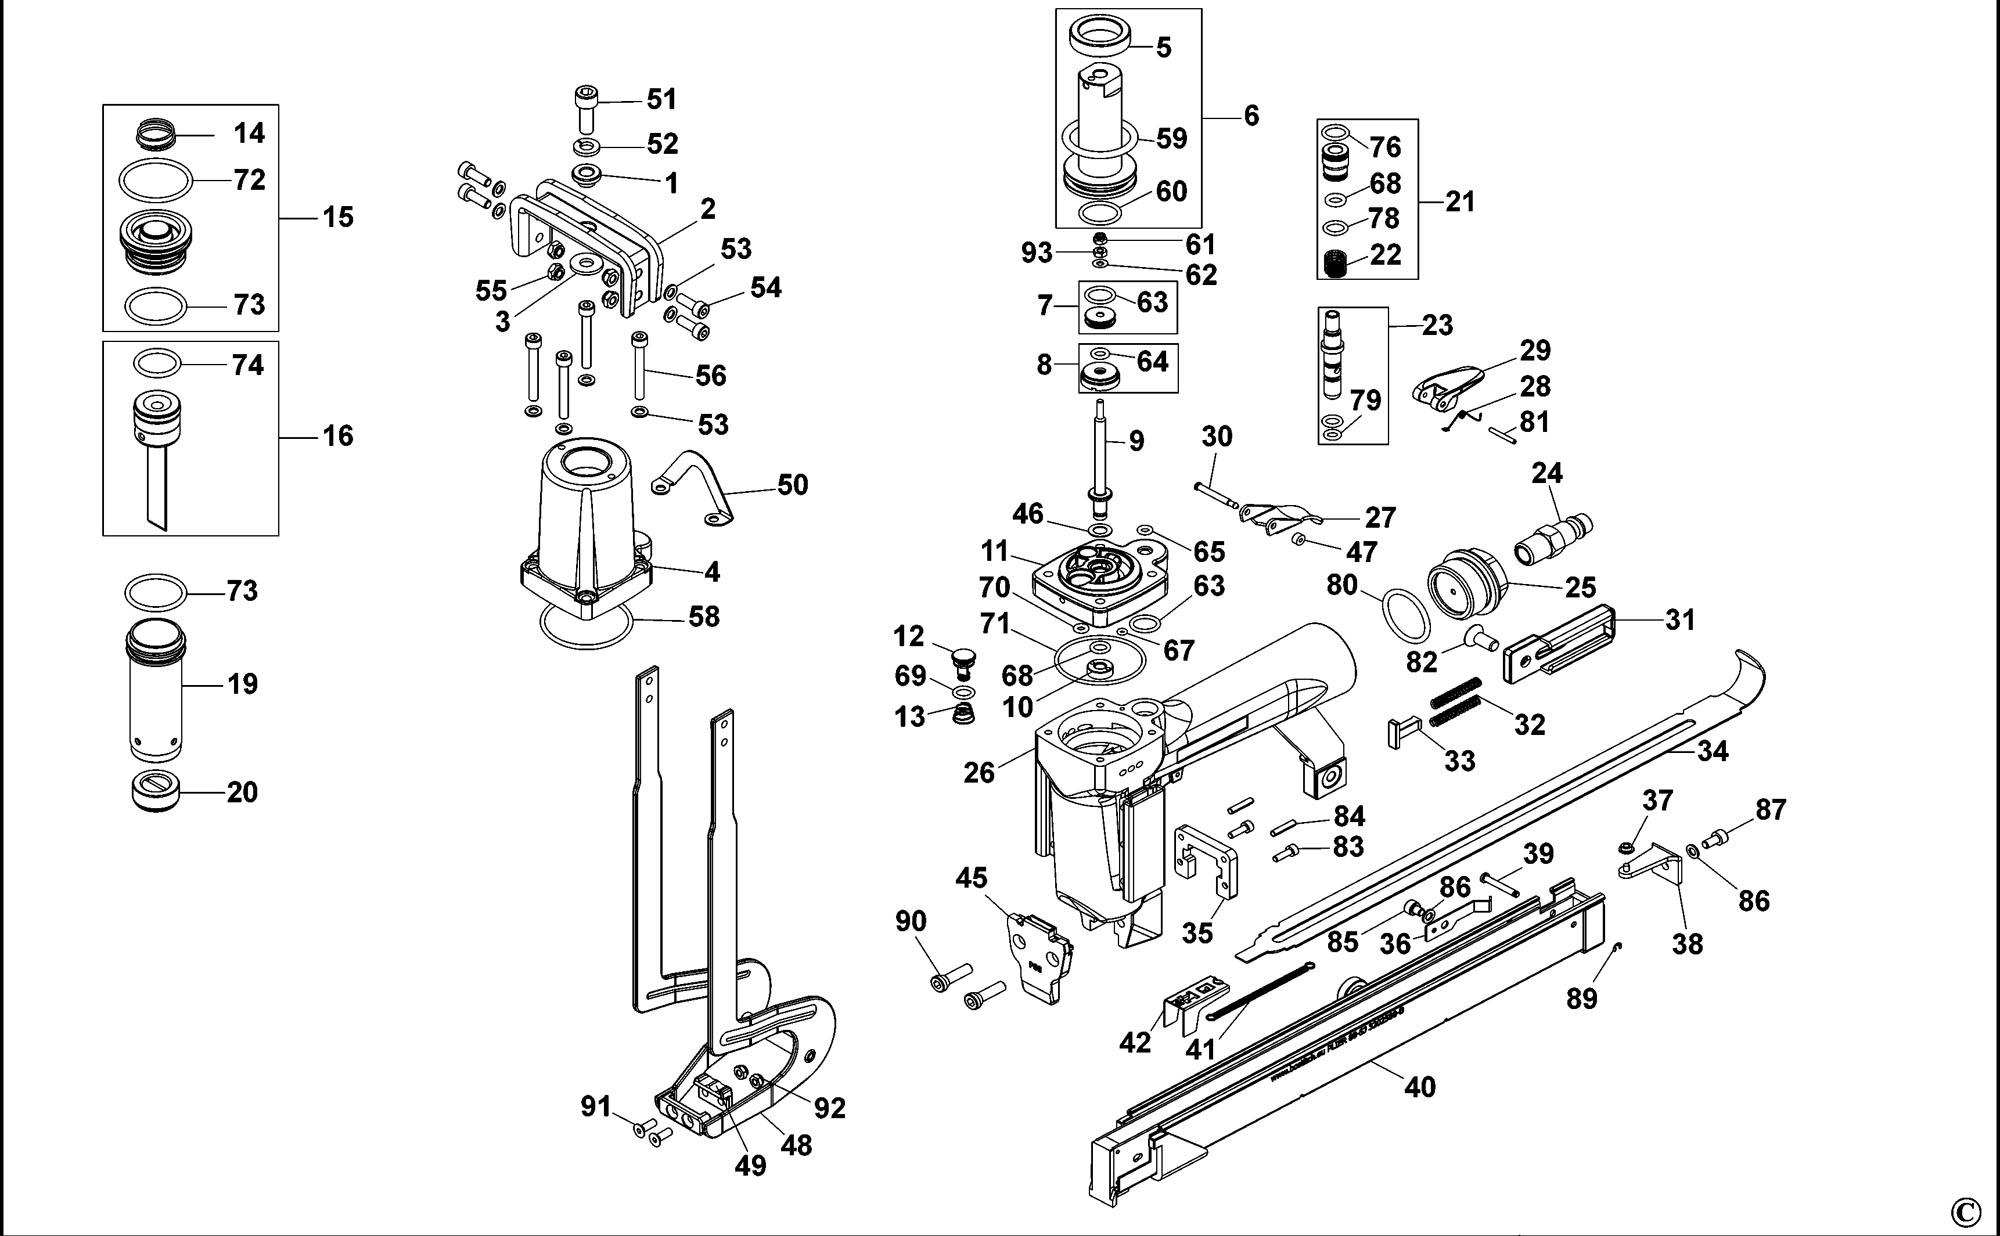 Spares For Bostitch P88sj Pneumatic Stapler Type Revc Spare P88sj Type Revc From Power Tool Centre